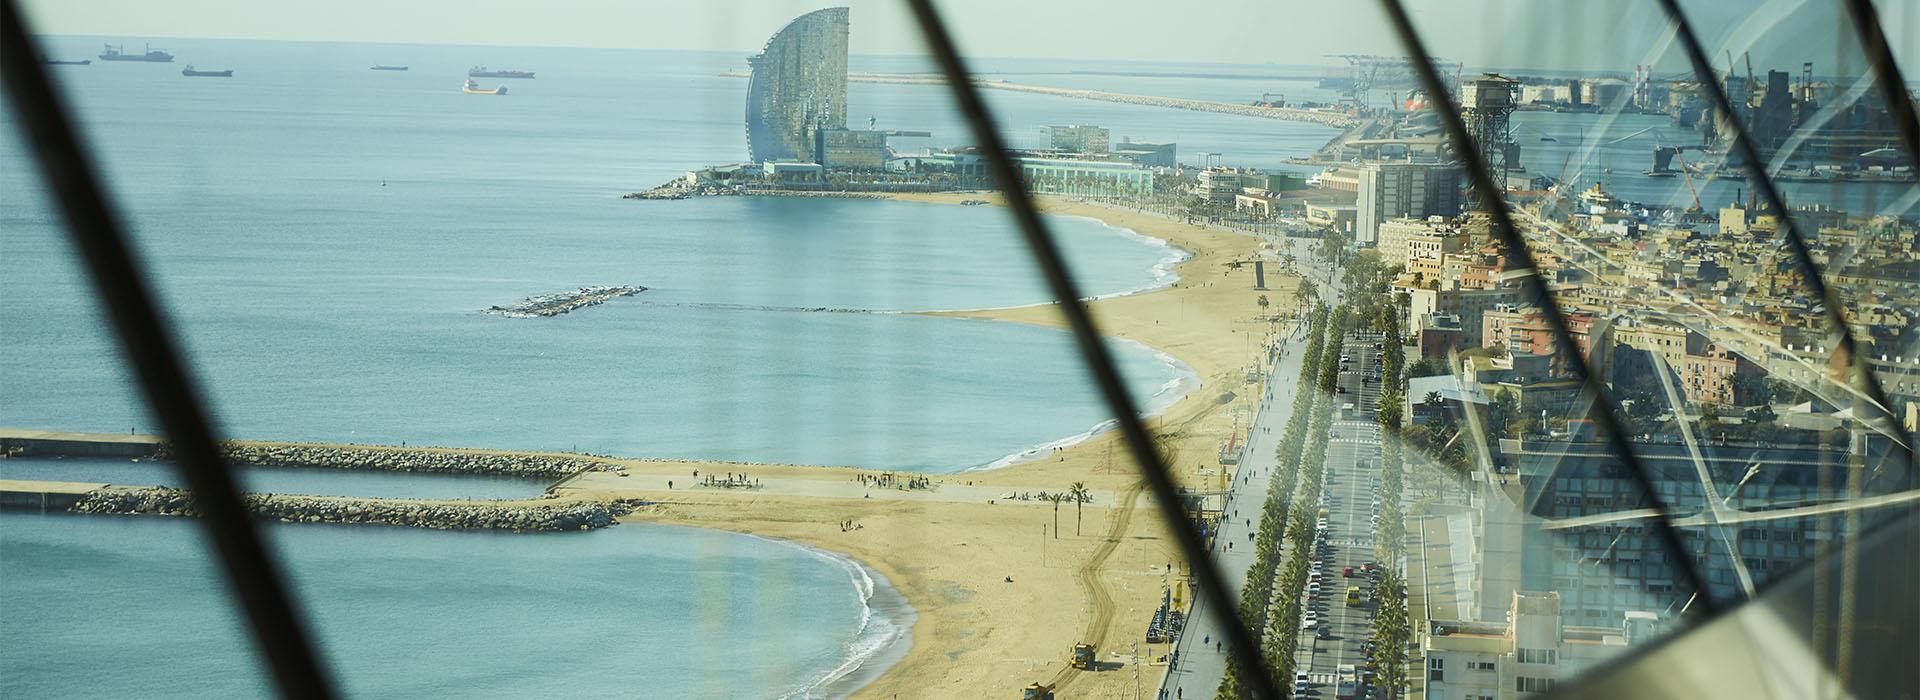 BCN beach view from windows